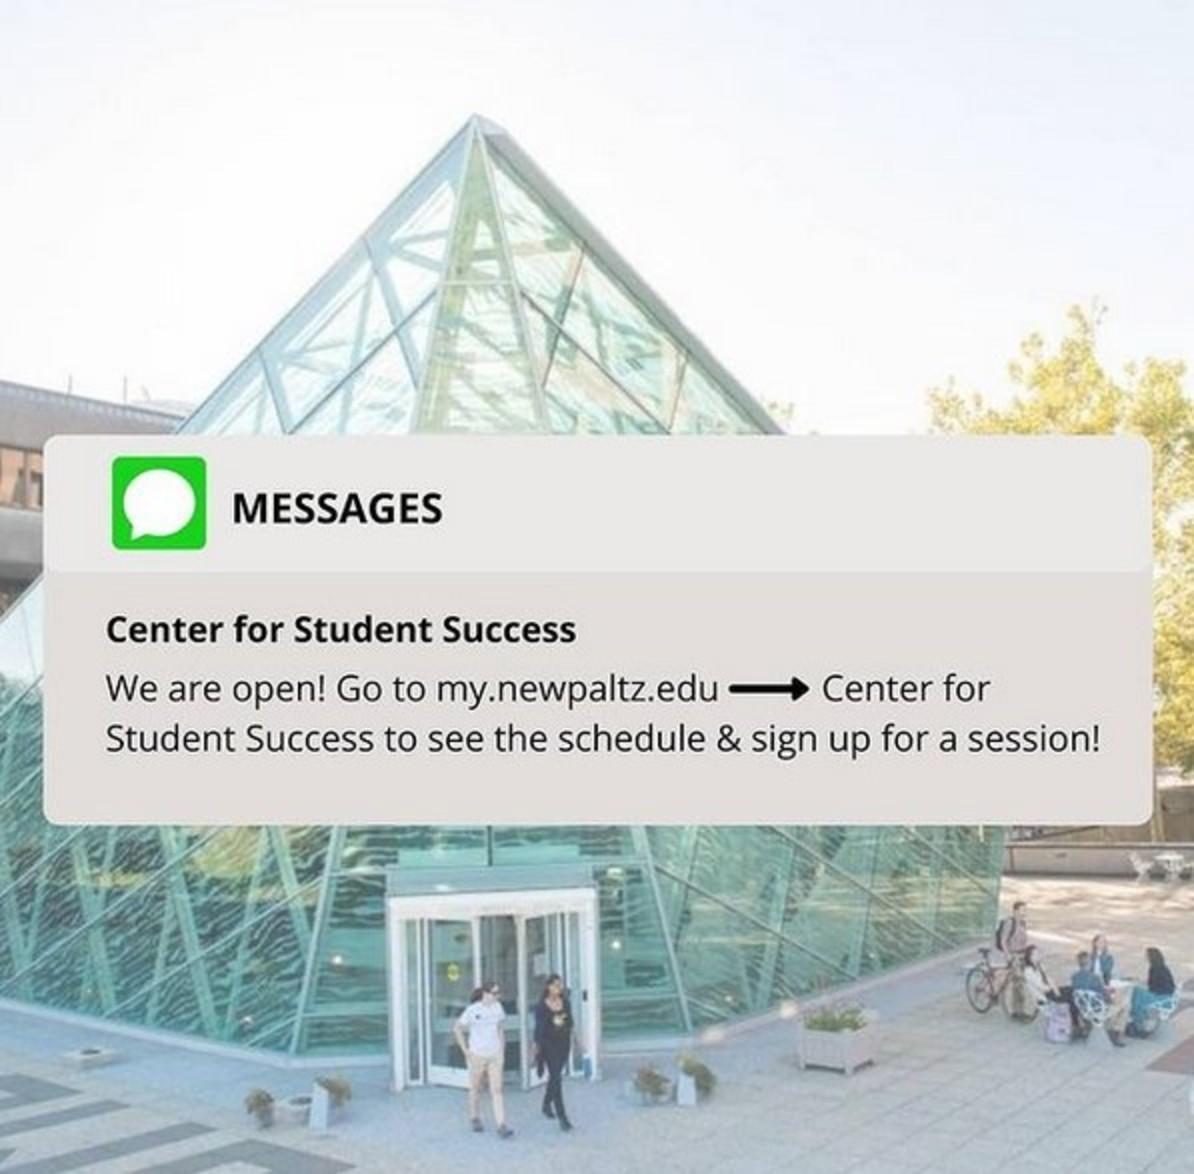 Center for Student Success on Instagram